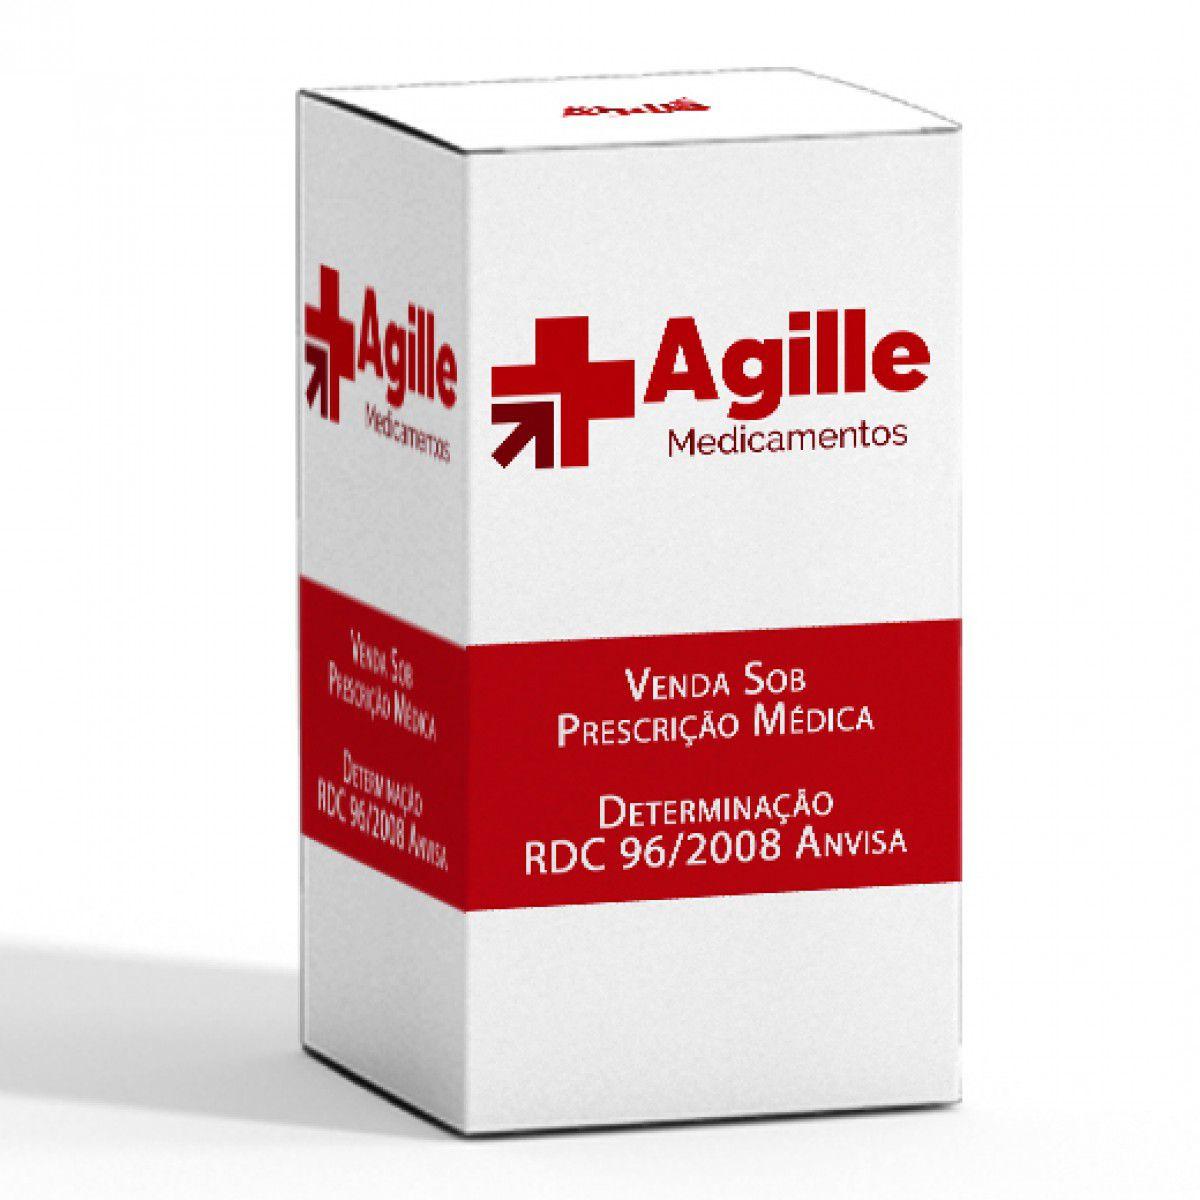 PAMIDRONATO DISSODICO 30MG (2FRA + DIL 10ML) G  - Agille Speciality